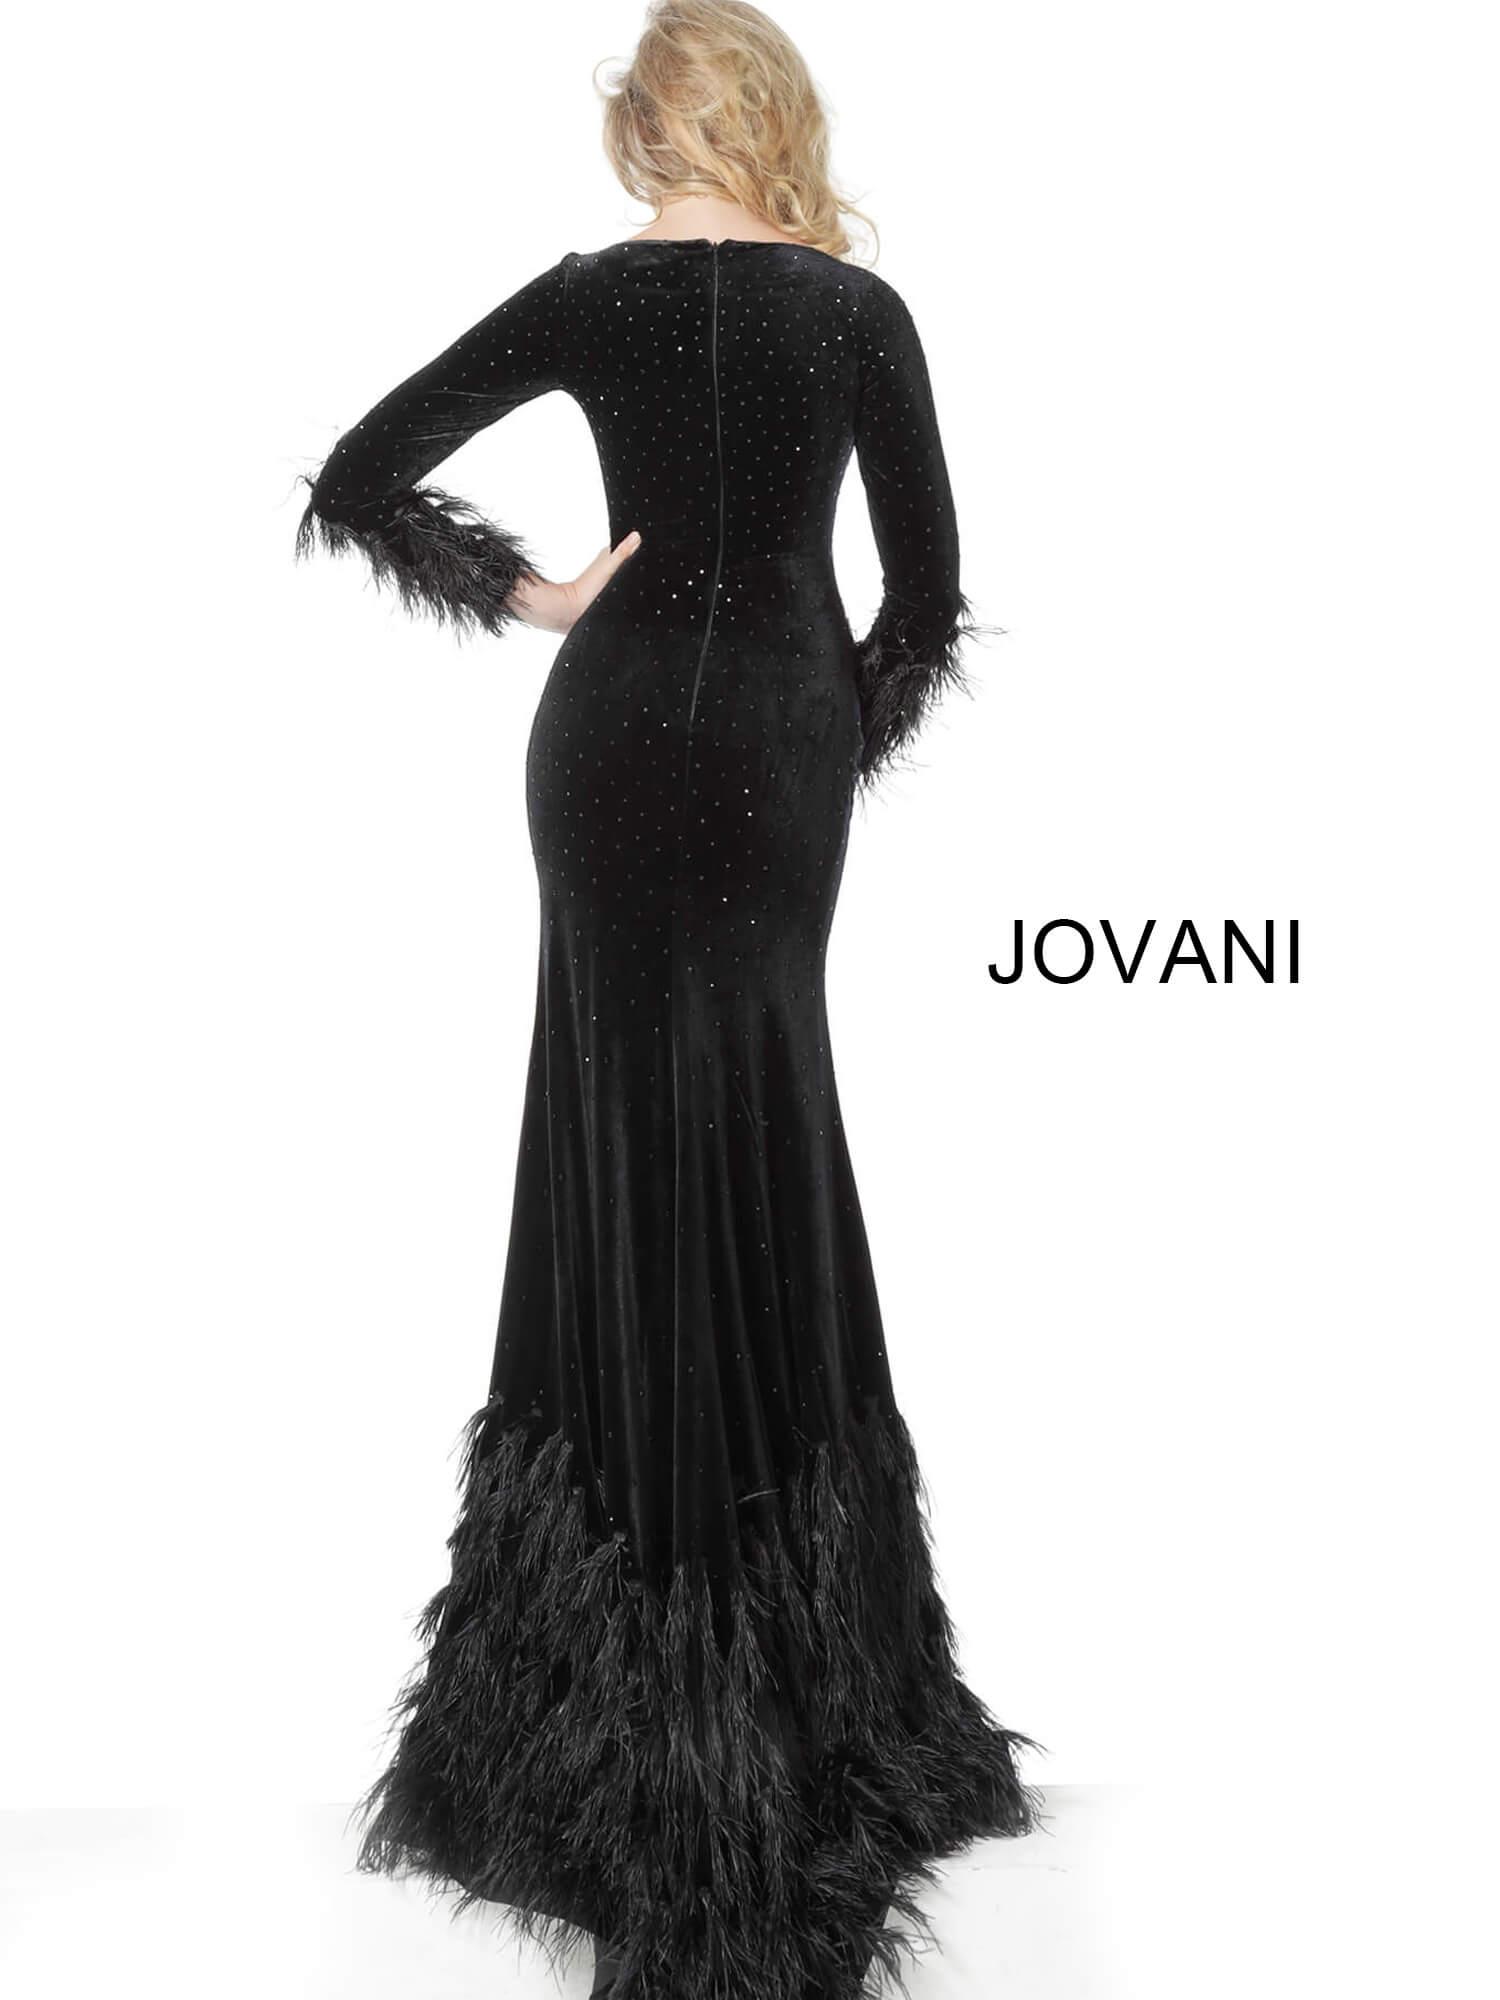 Jovani 1085 | Black Long Sleeves Sheath